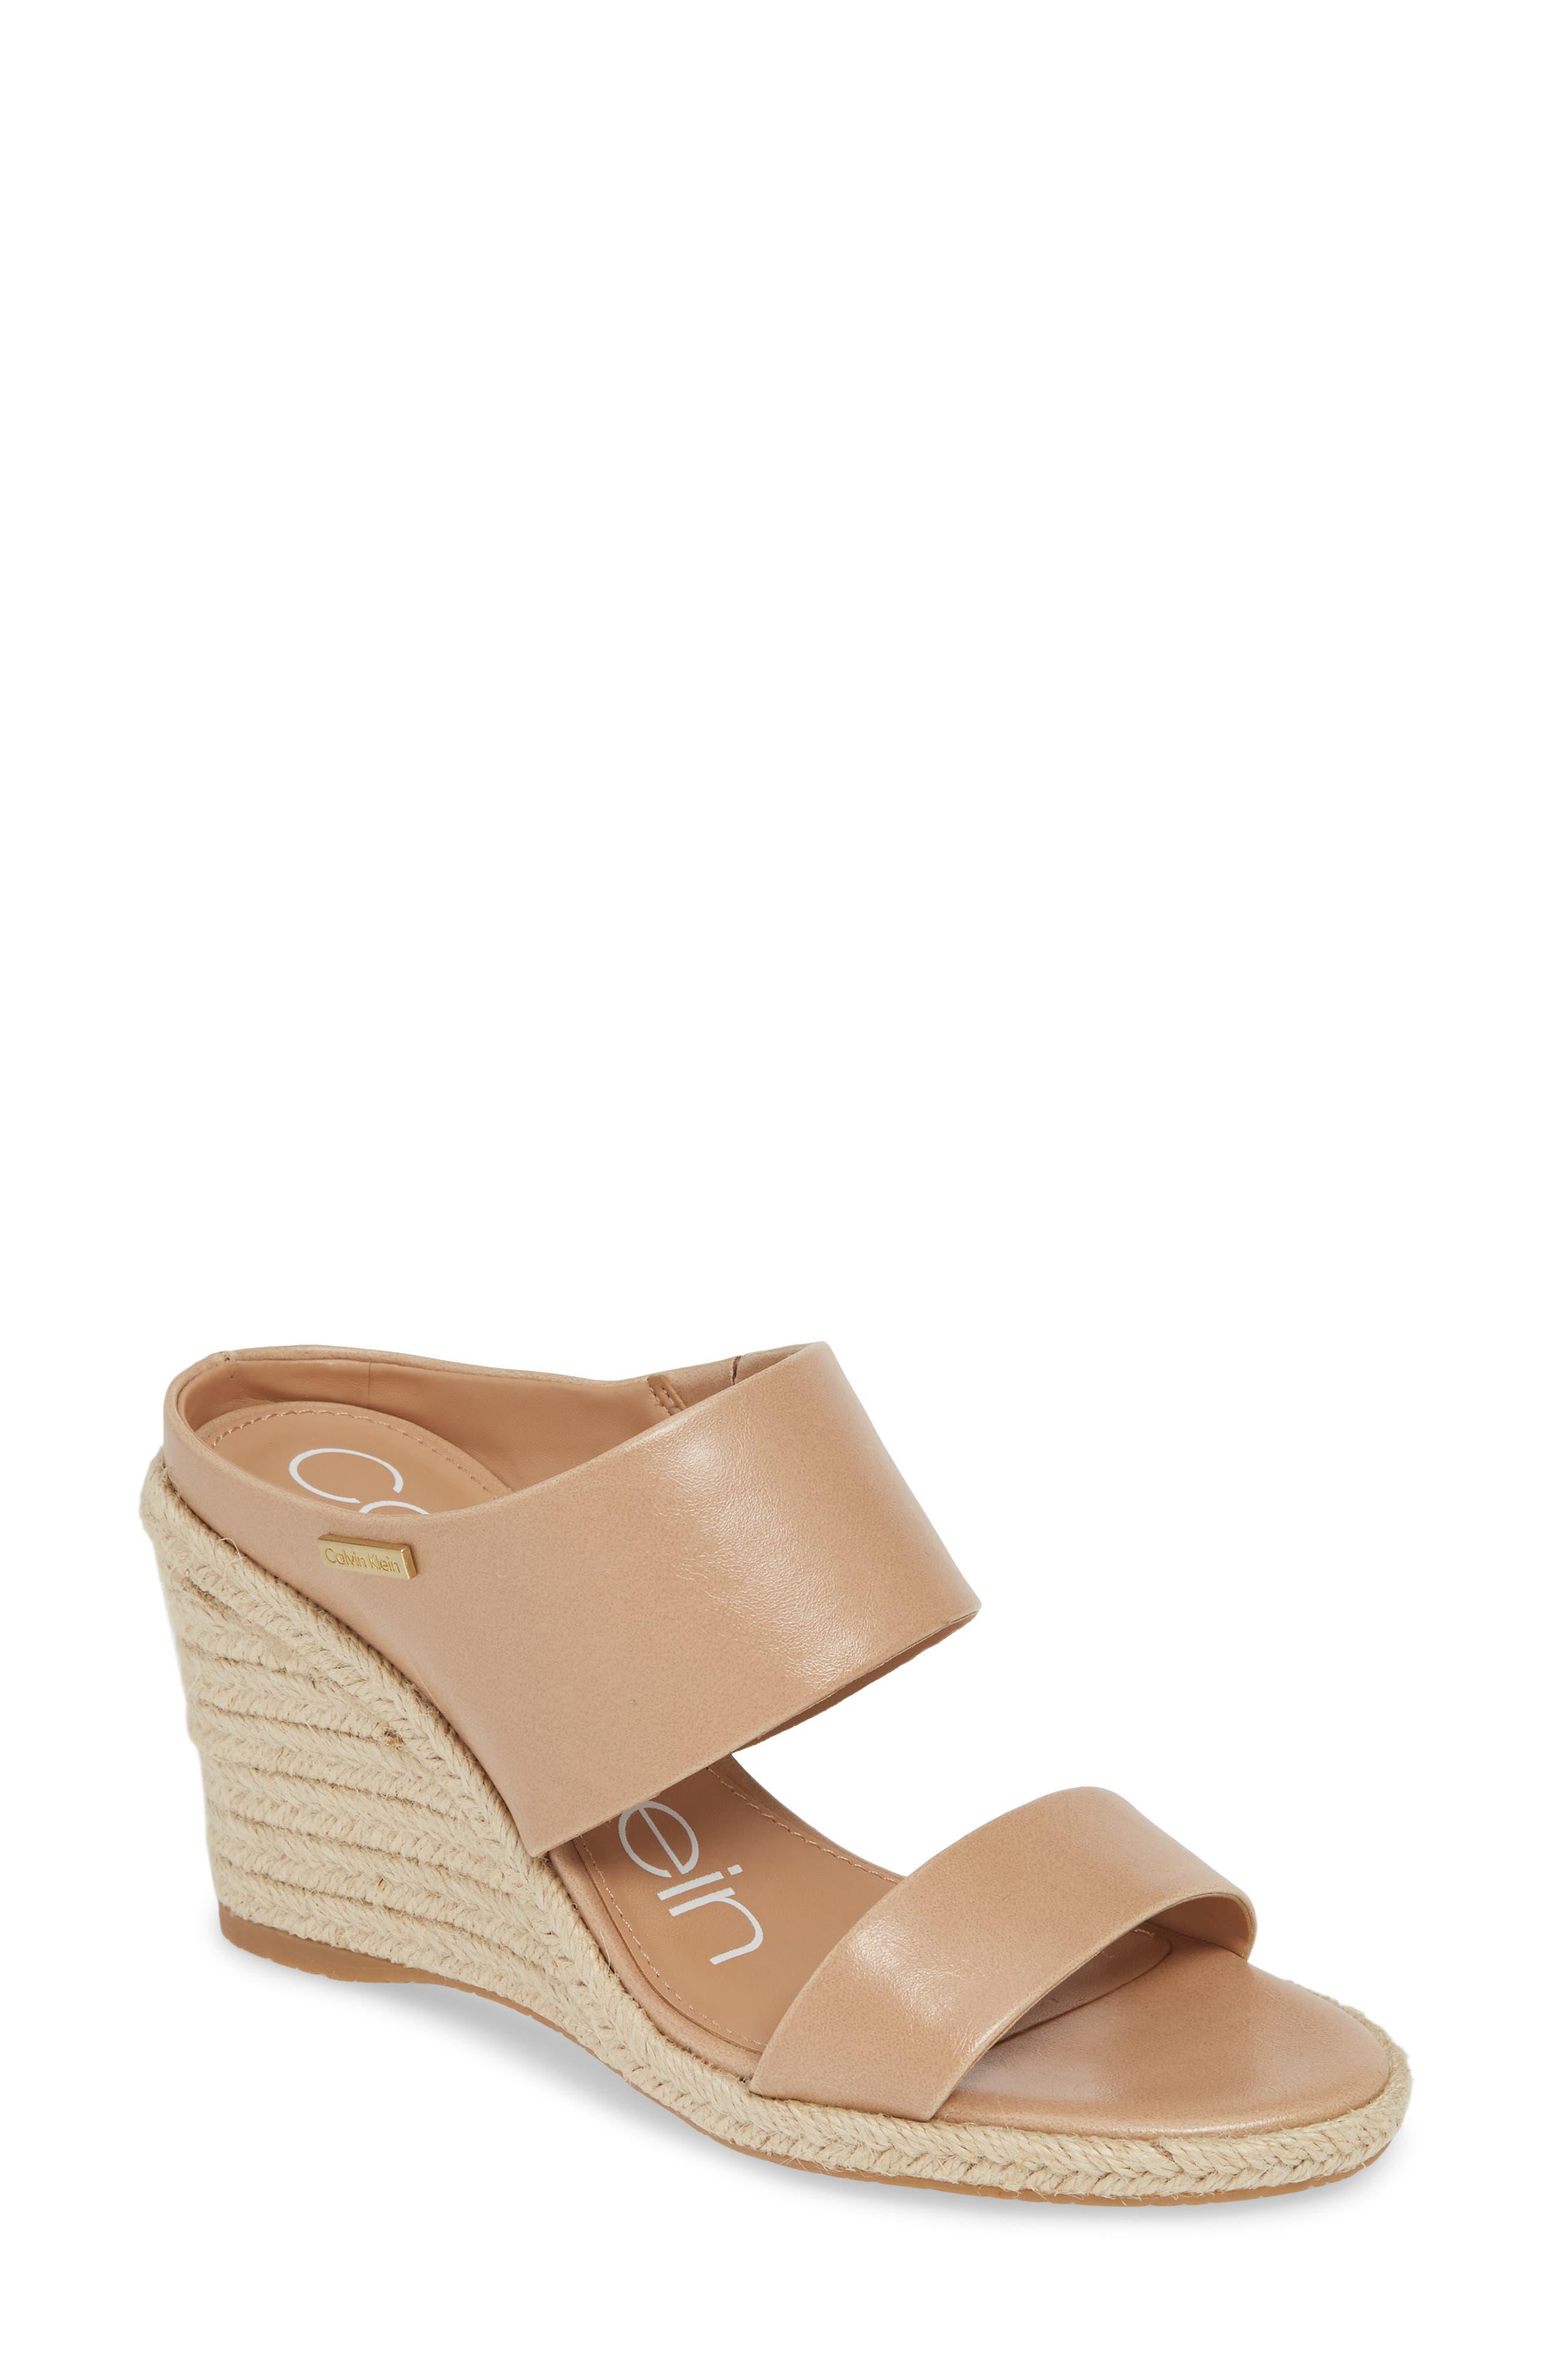 Calvin Klein Brooke Espadrille Wedge Sandal, Beige